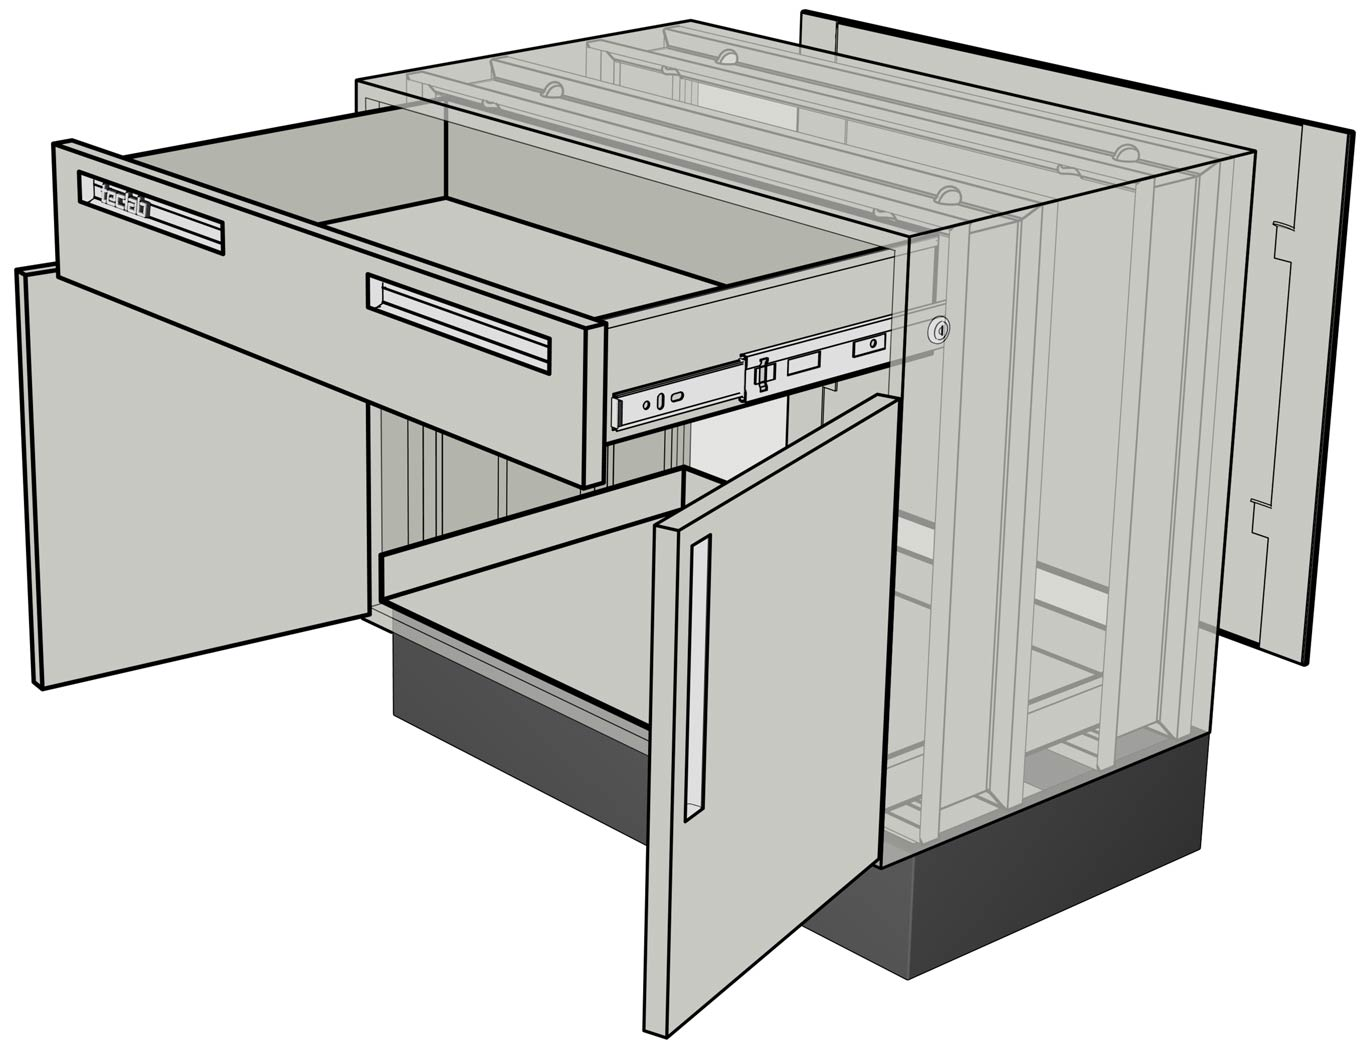 Base Cabinet Construction Details